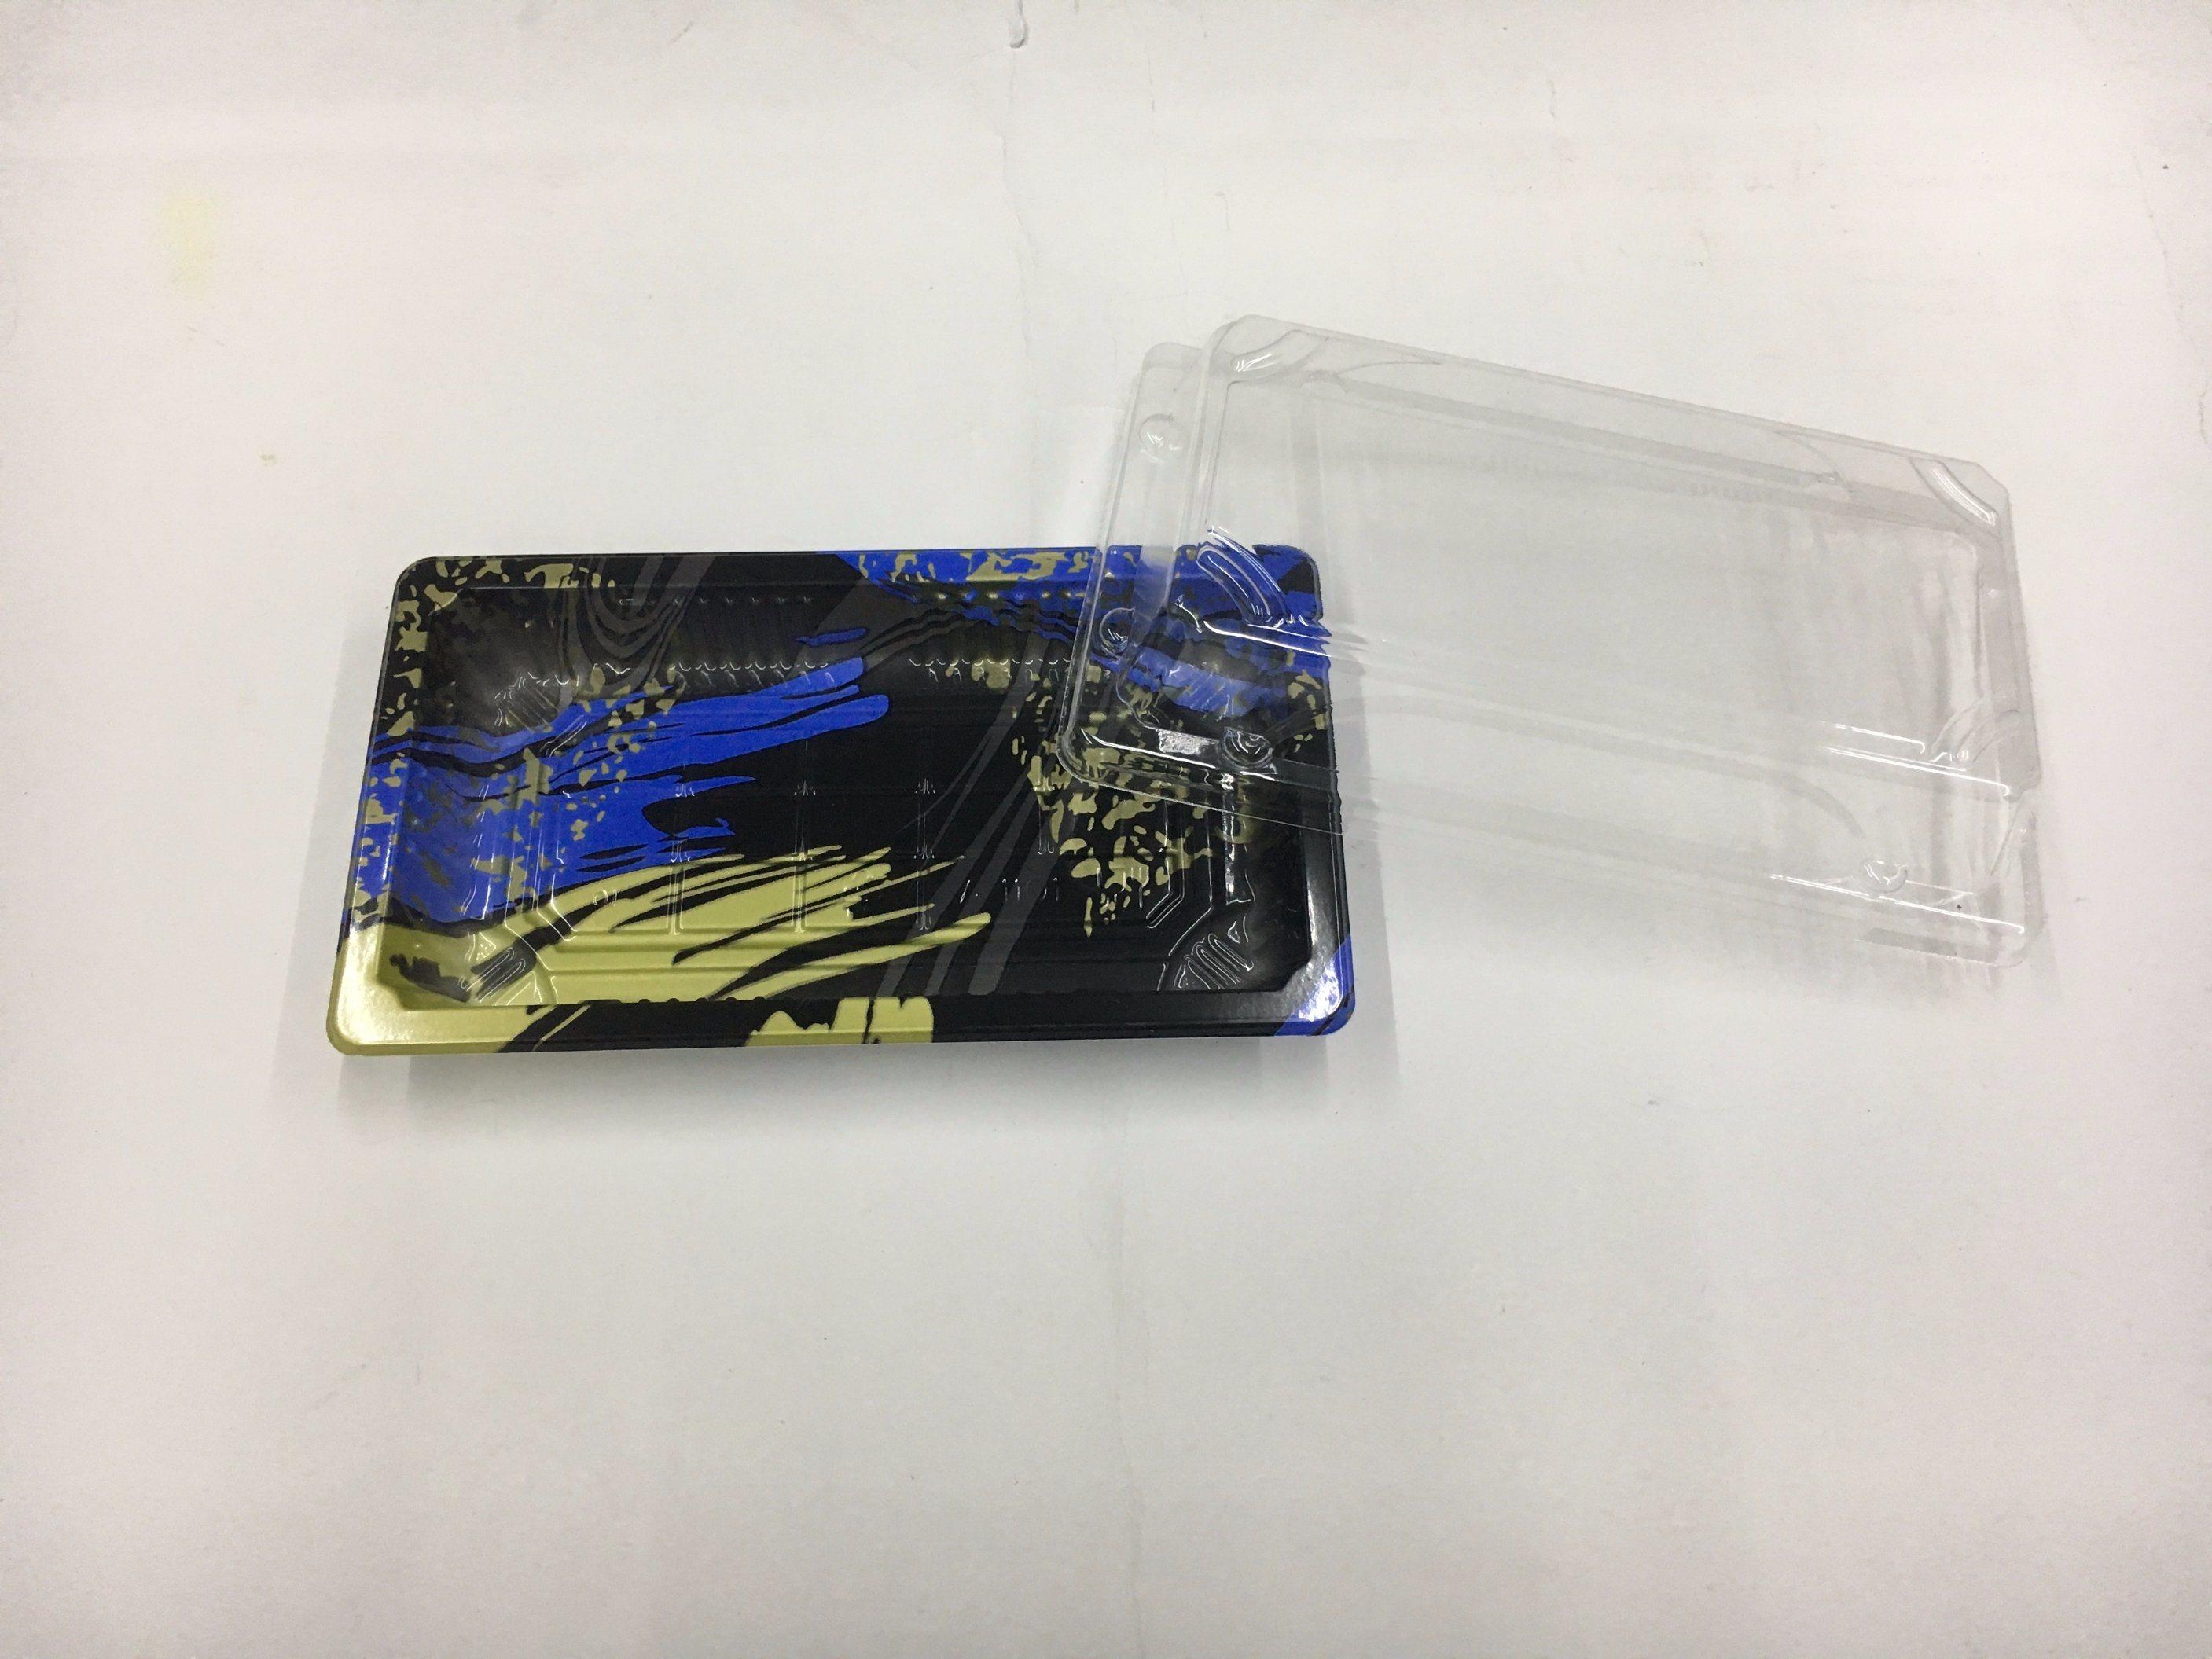 Plastic Printing Tray for Sushi